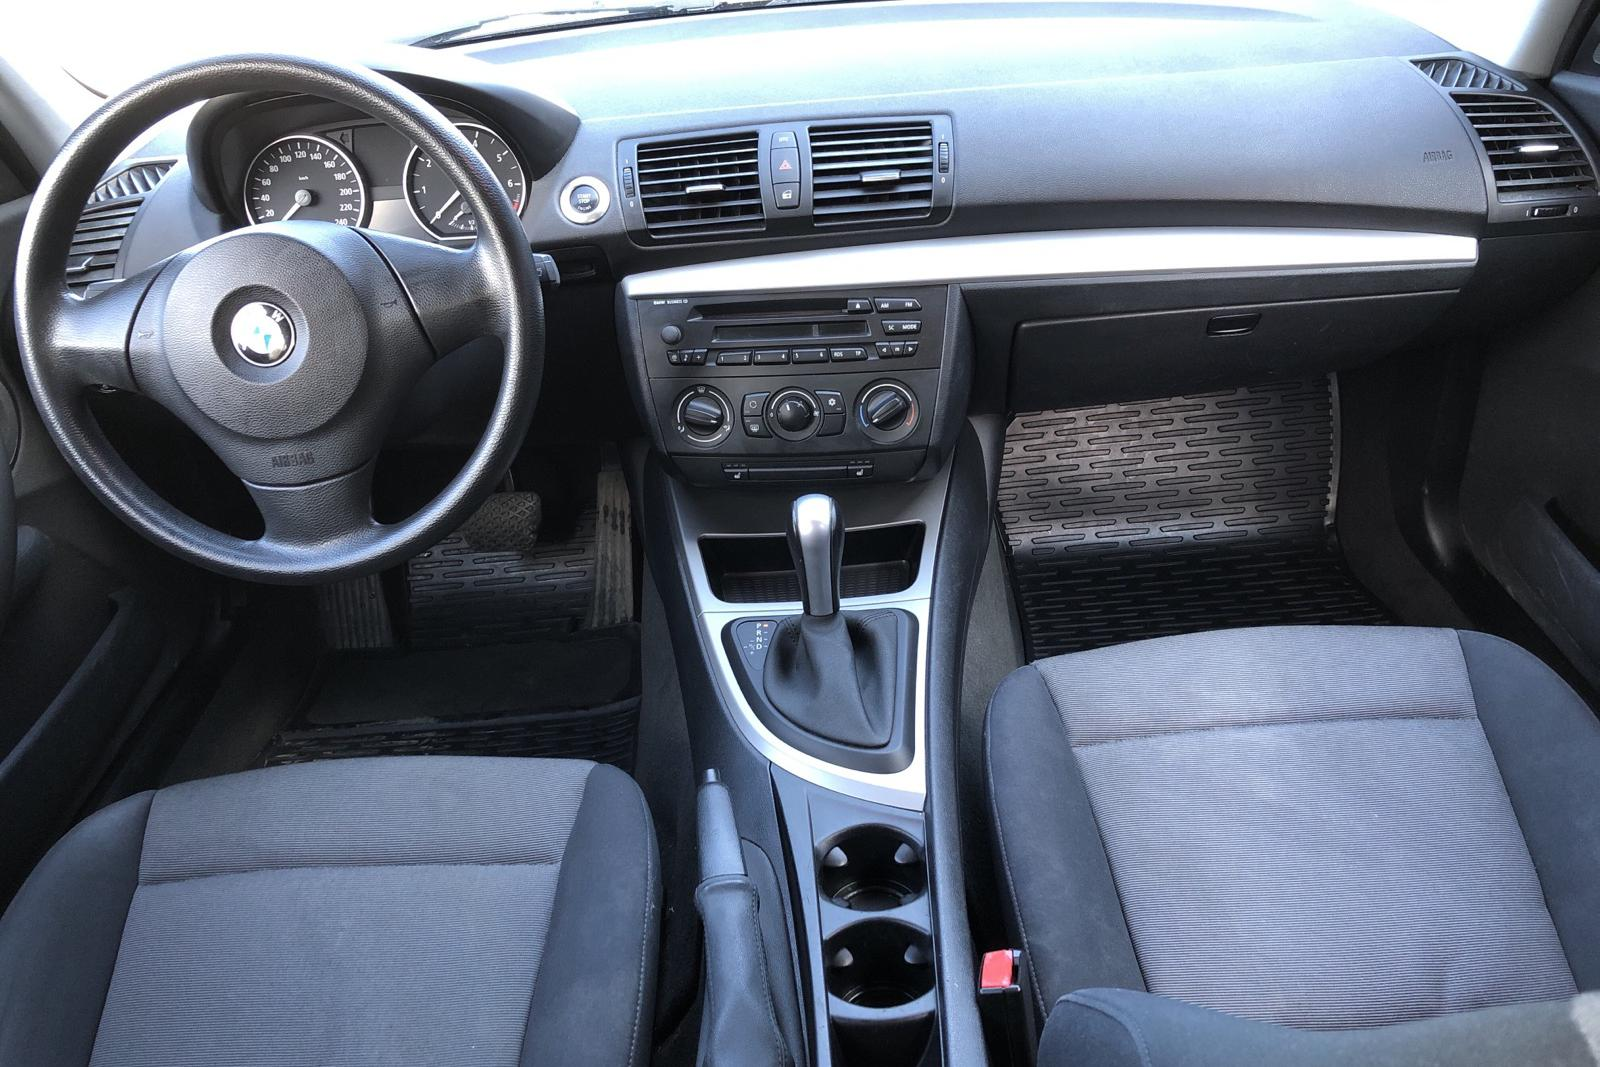 BMW 120i 5dr, E87 (150hk) - 118 530 km - Automatic - black - 2006